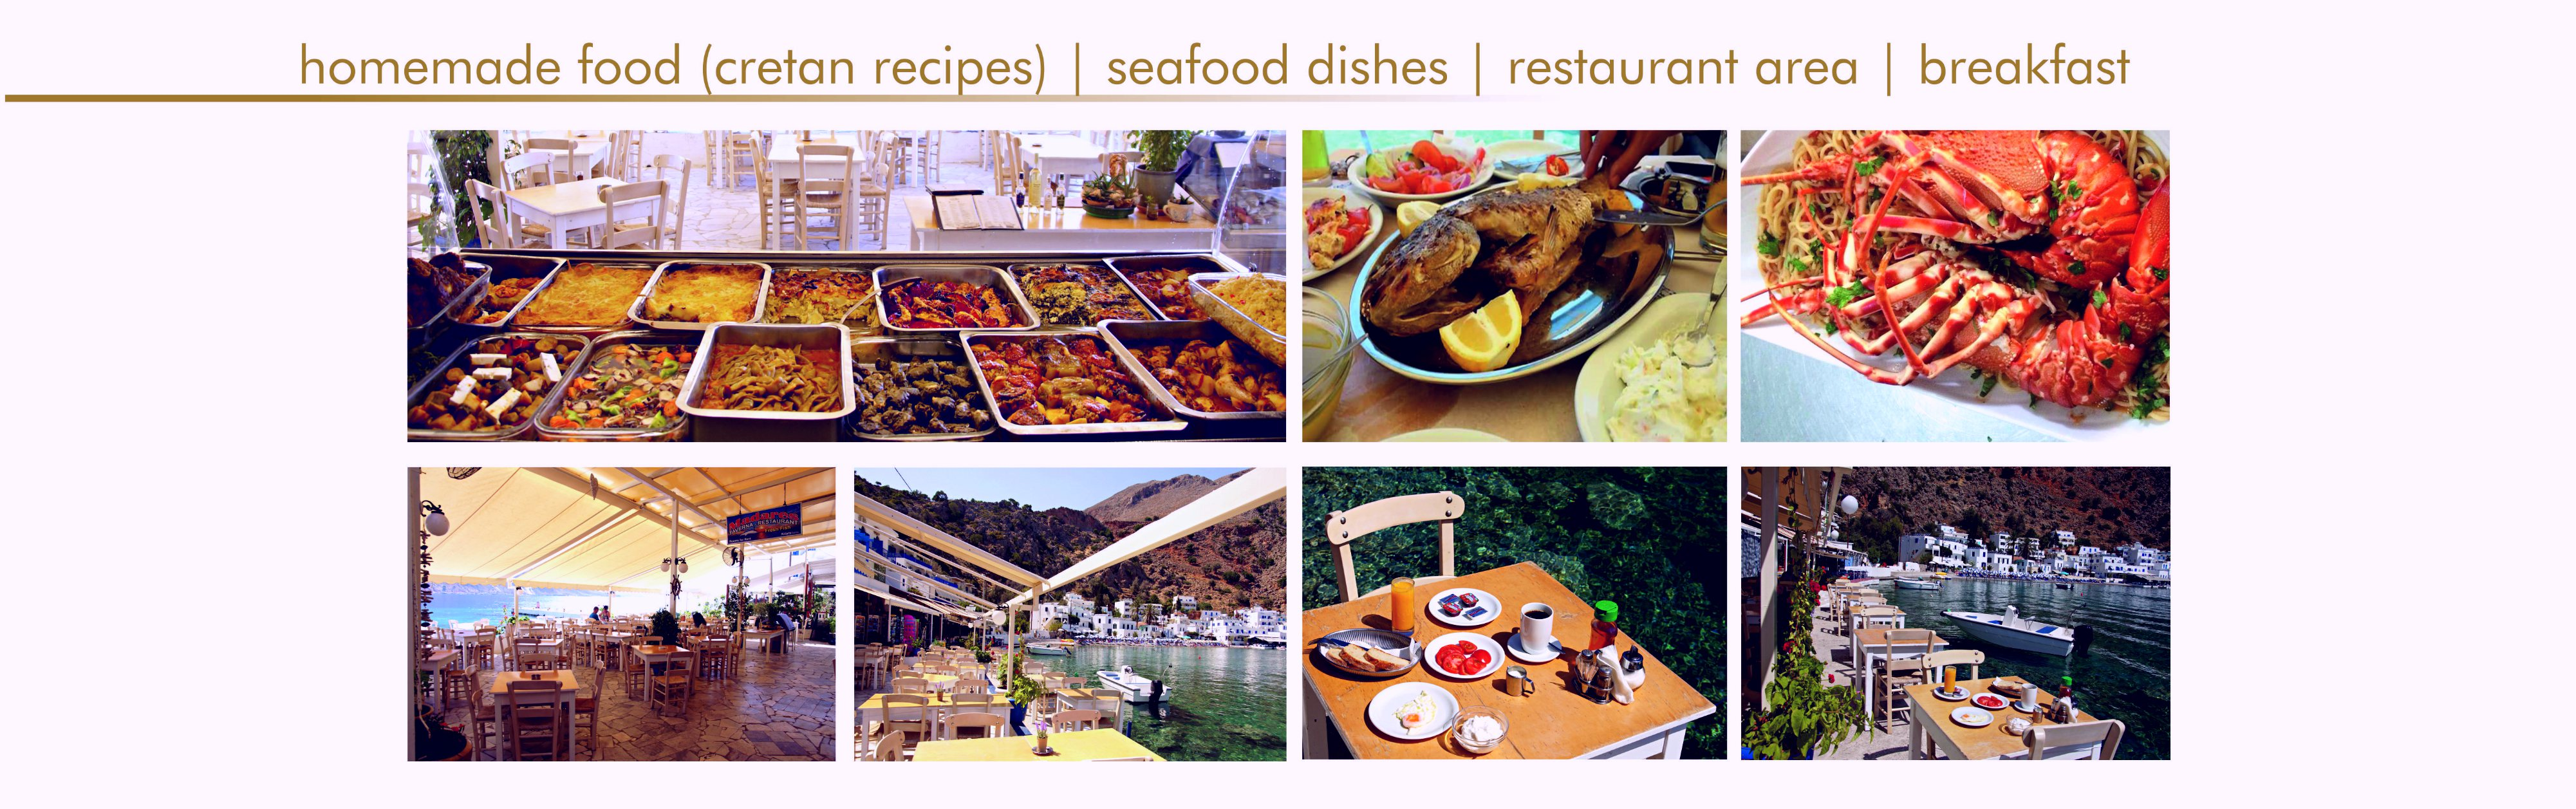 restaurant_images_852mb